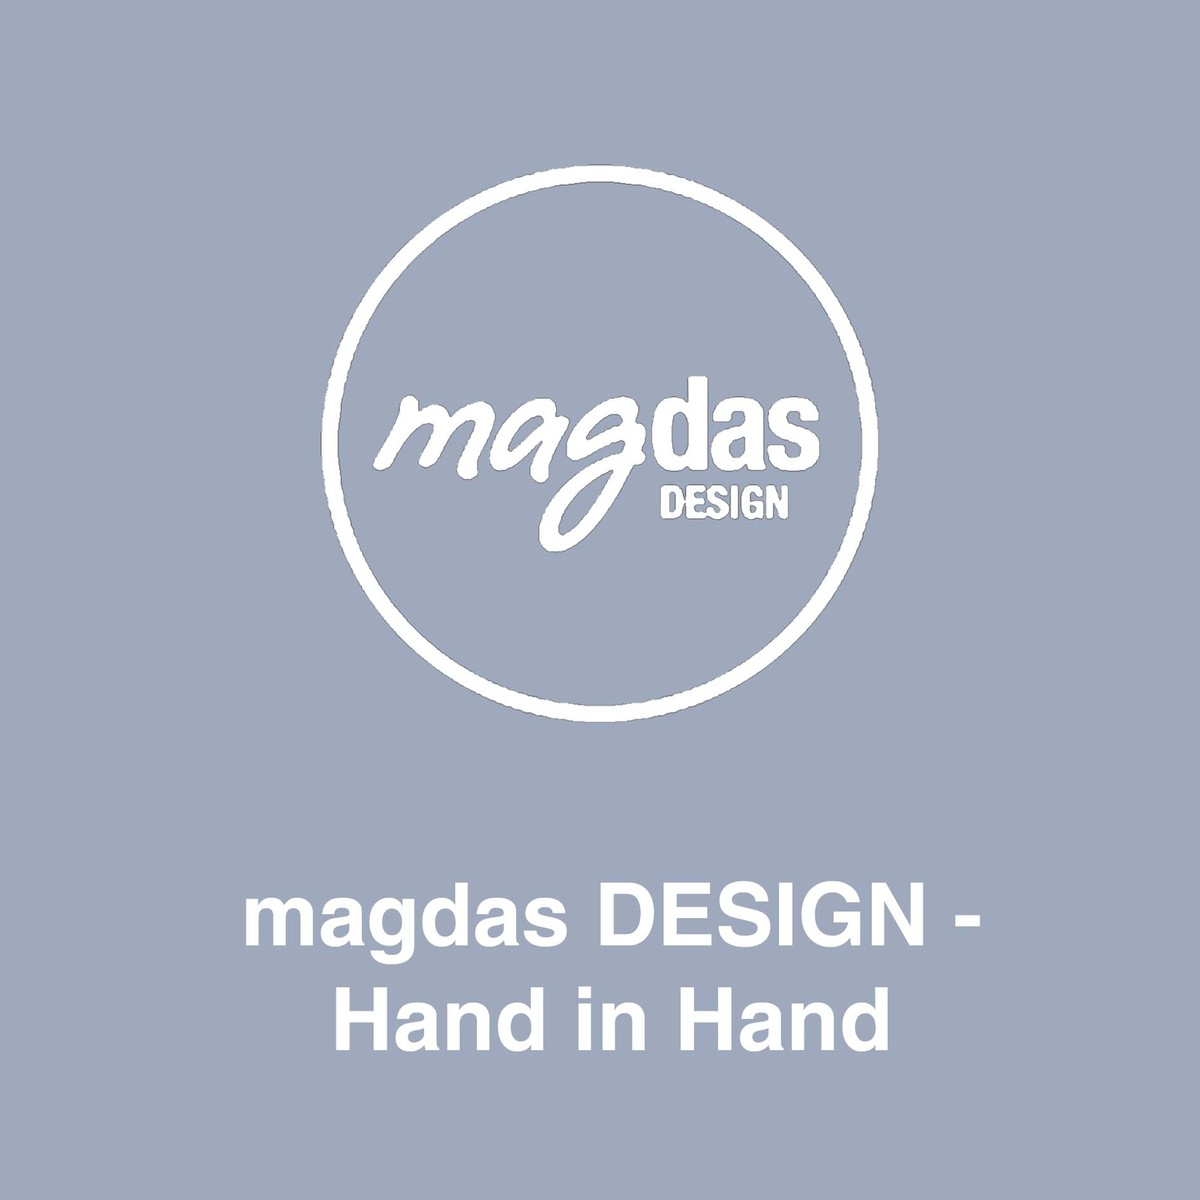 Caritas-Madgas-Design-wirhelfen